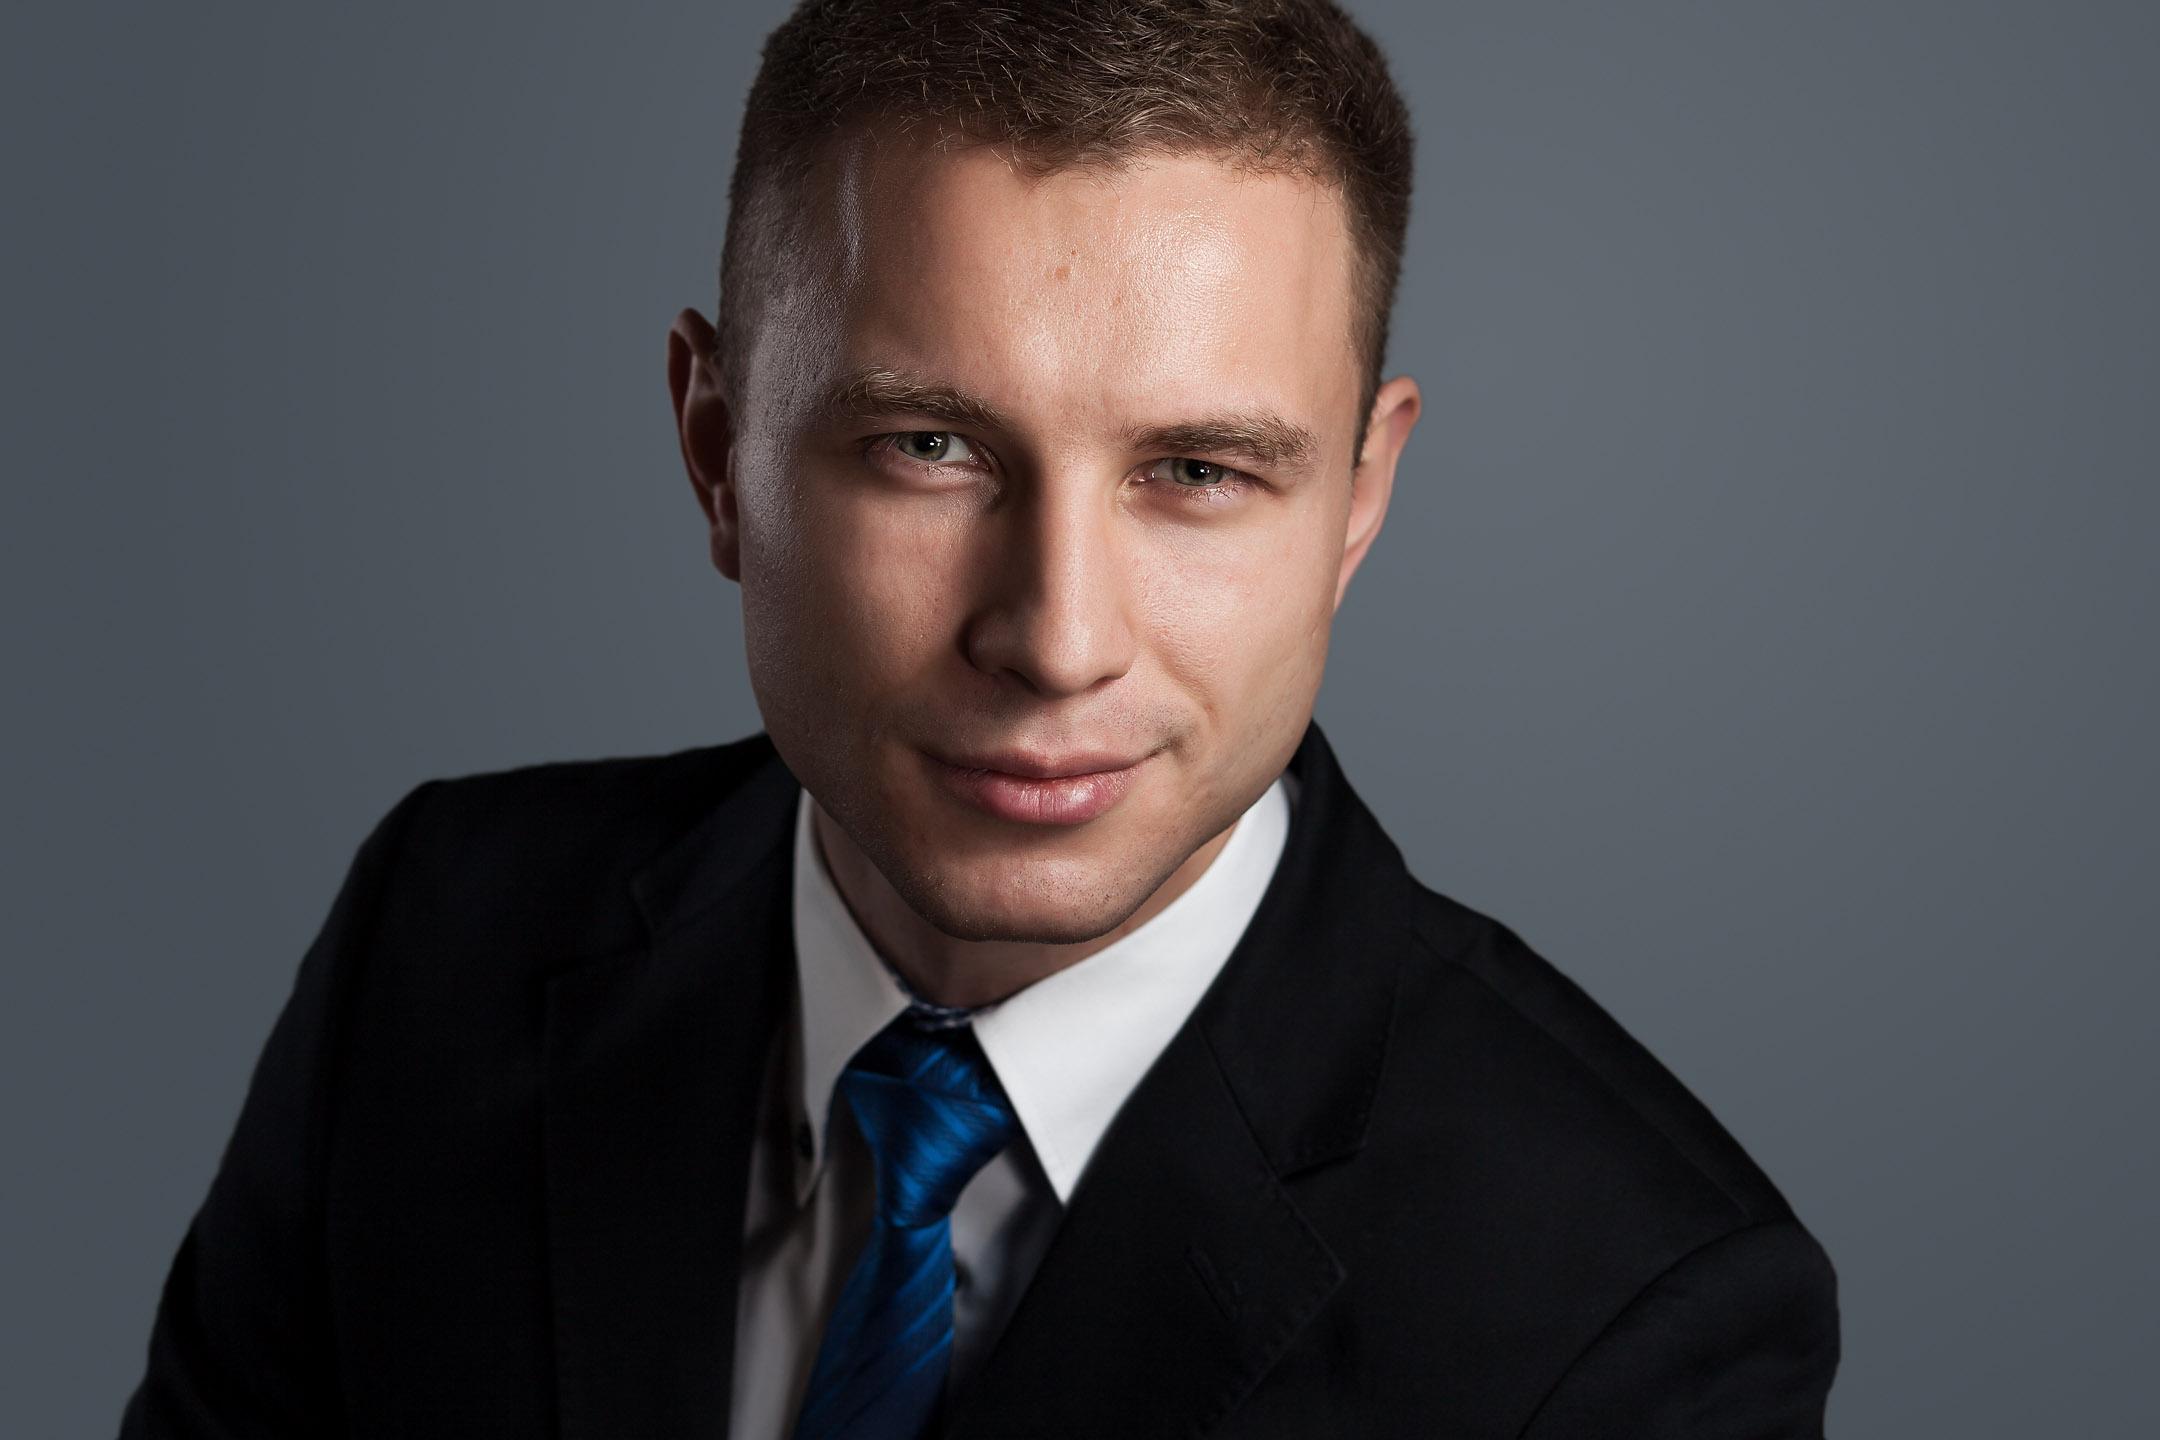 Business Headshot / Portrait